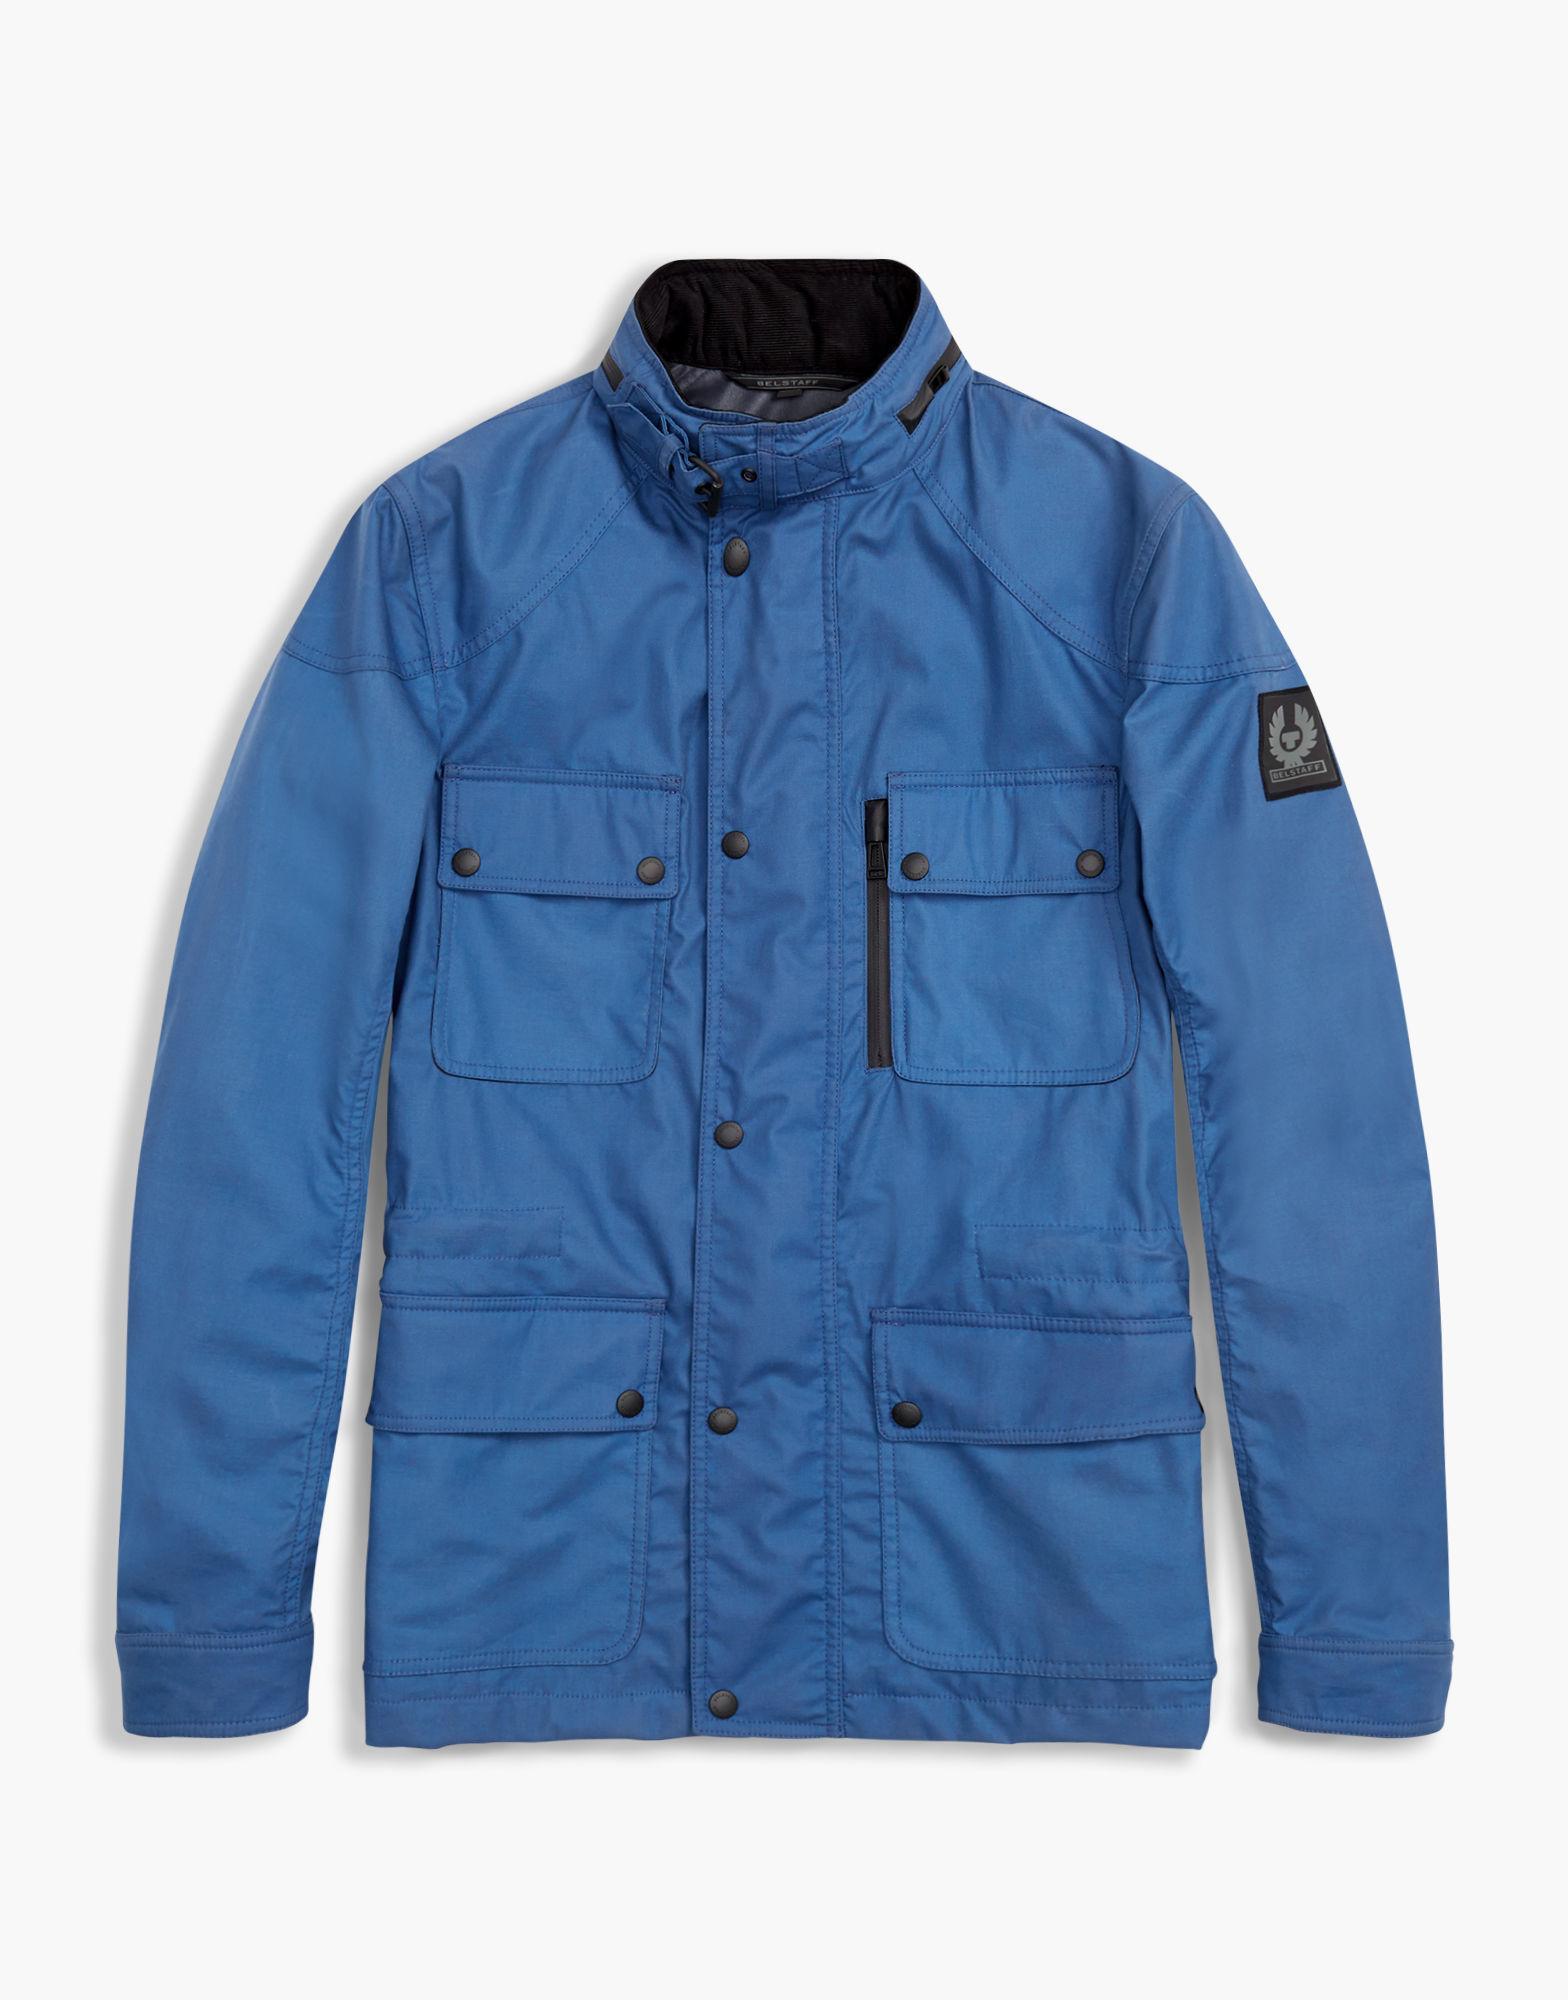 24f44dc67fe Belstaff Trialmaster Hooded Jacket in Blue for Men - Lyst